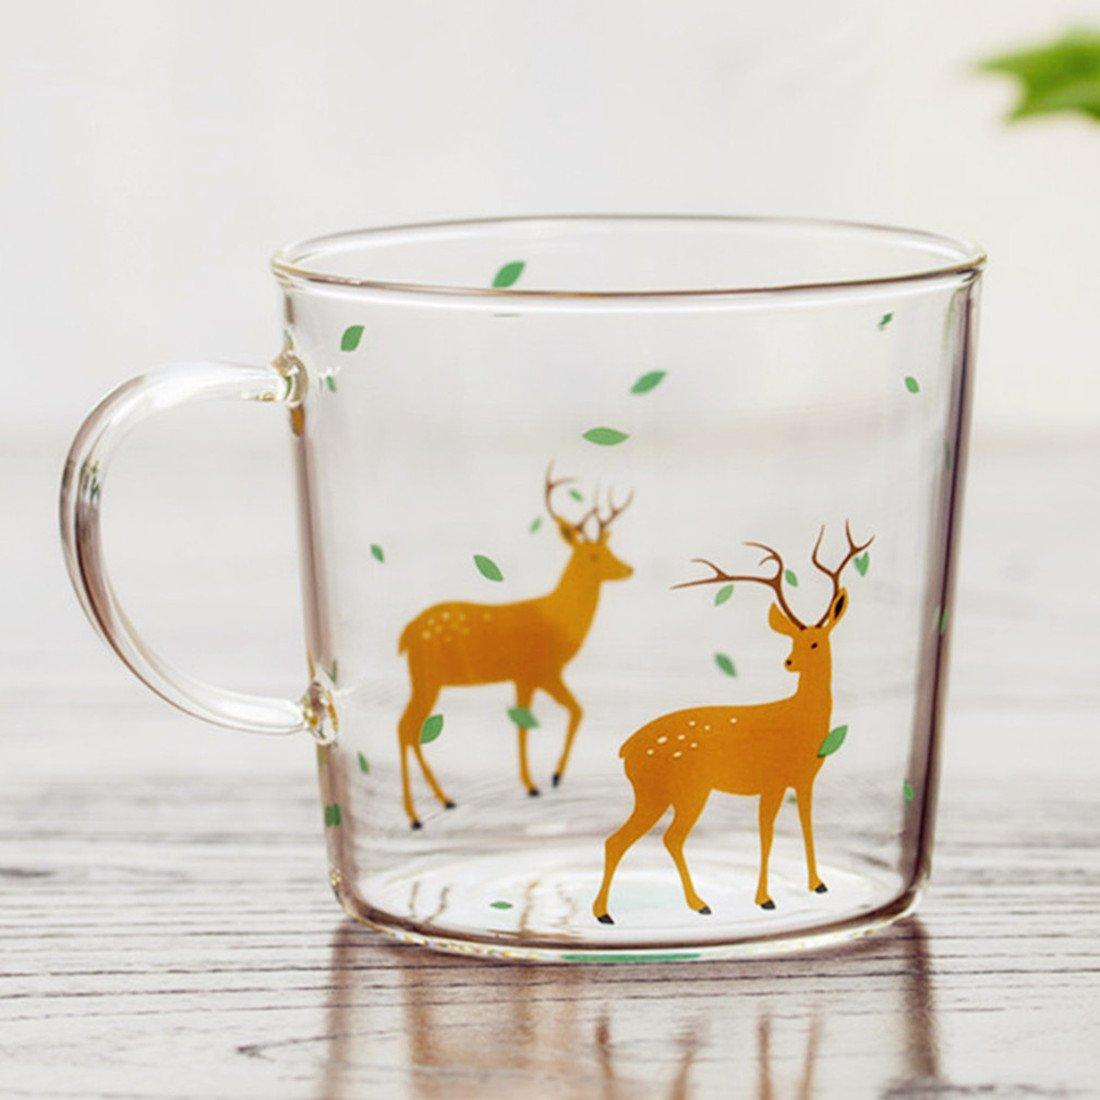 Deer Printed Glass Mug with Handle,Cute Animal Borosilicate Glass Cups Drinking Tea, Latte, Espresso, Juice,Milk,By Mr.Mug & Ms.Cup (310ml,10.1OZ)